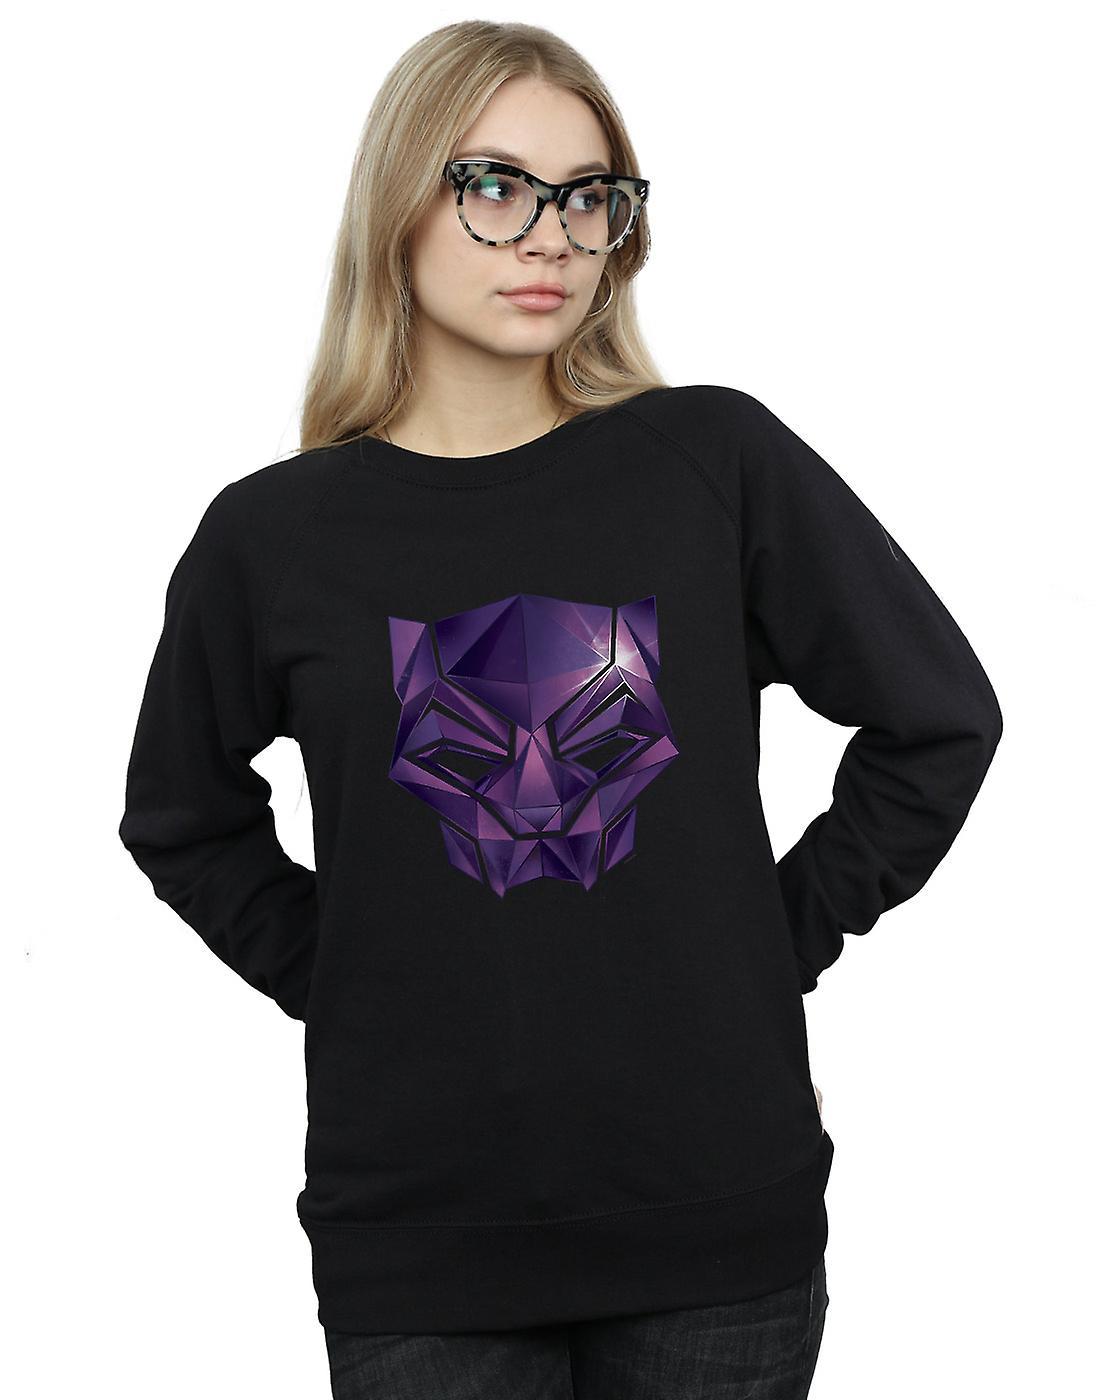 Marvel Women's Avengers Infinity War Black Panther Geometric Sweatshirt